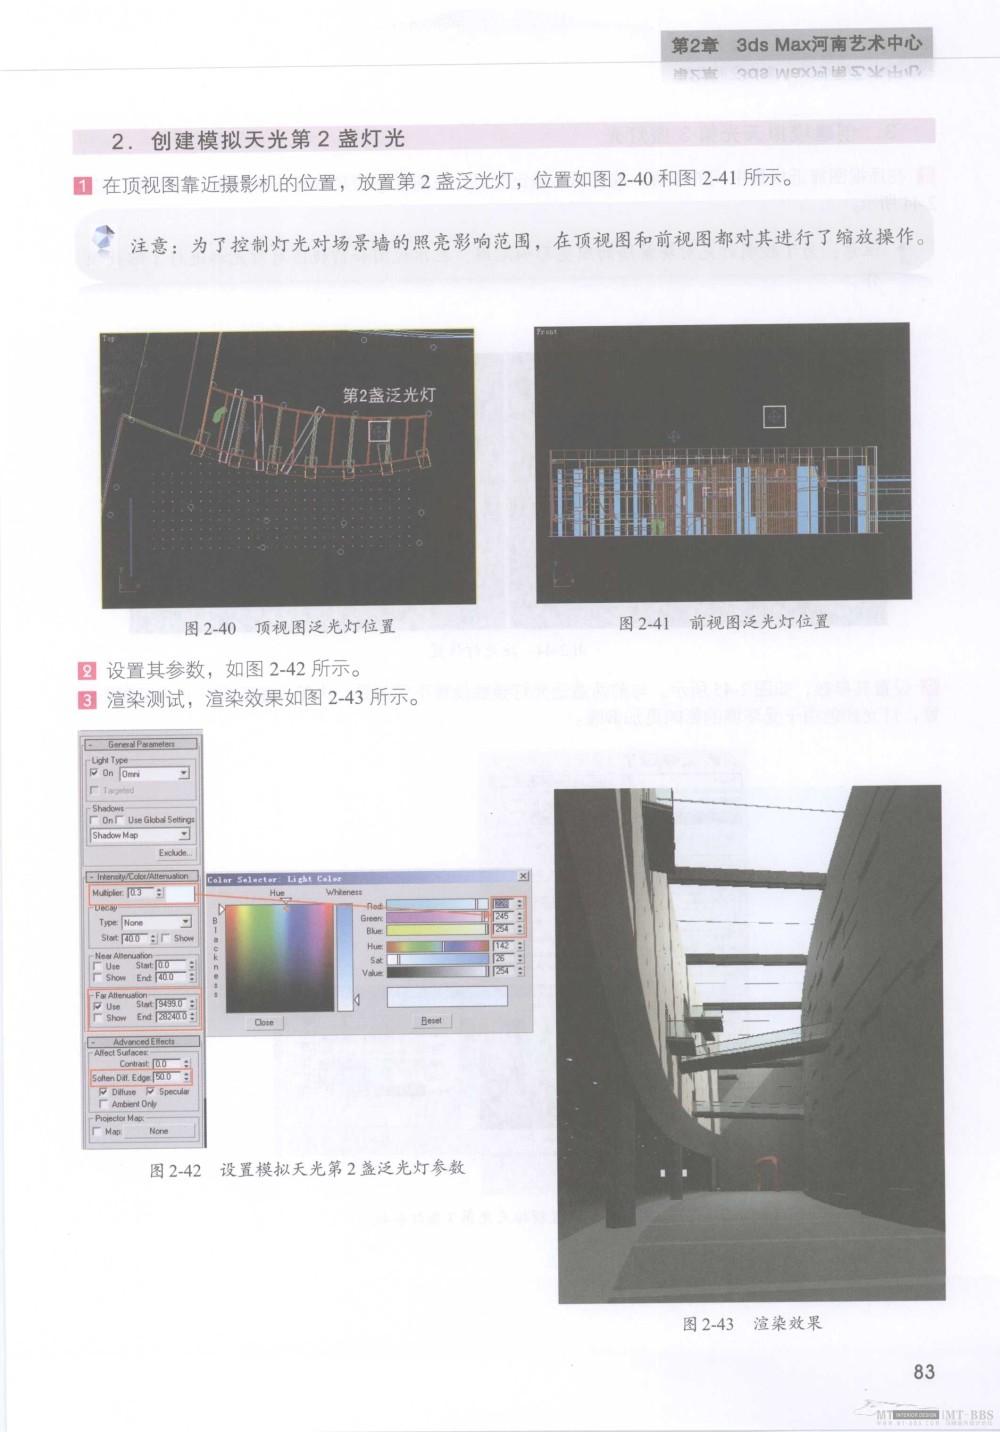 水晶石技法-3ds_Max&VRay室内空间表现_水晶石技法-3ds_Max&VRay室内空间表现_页面_089.jpg